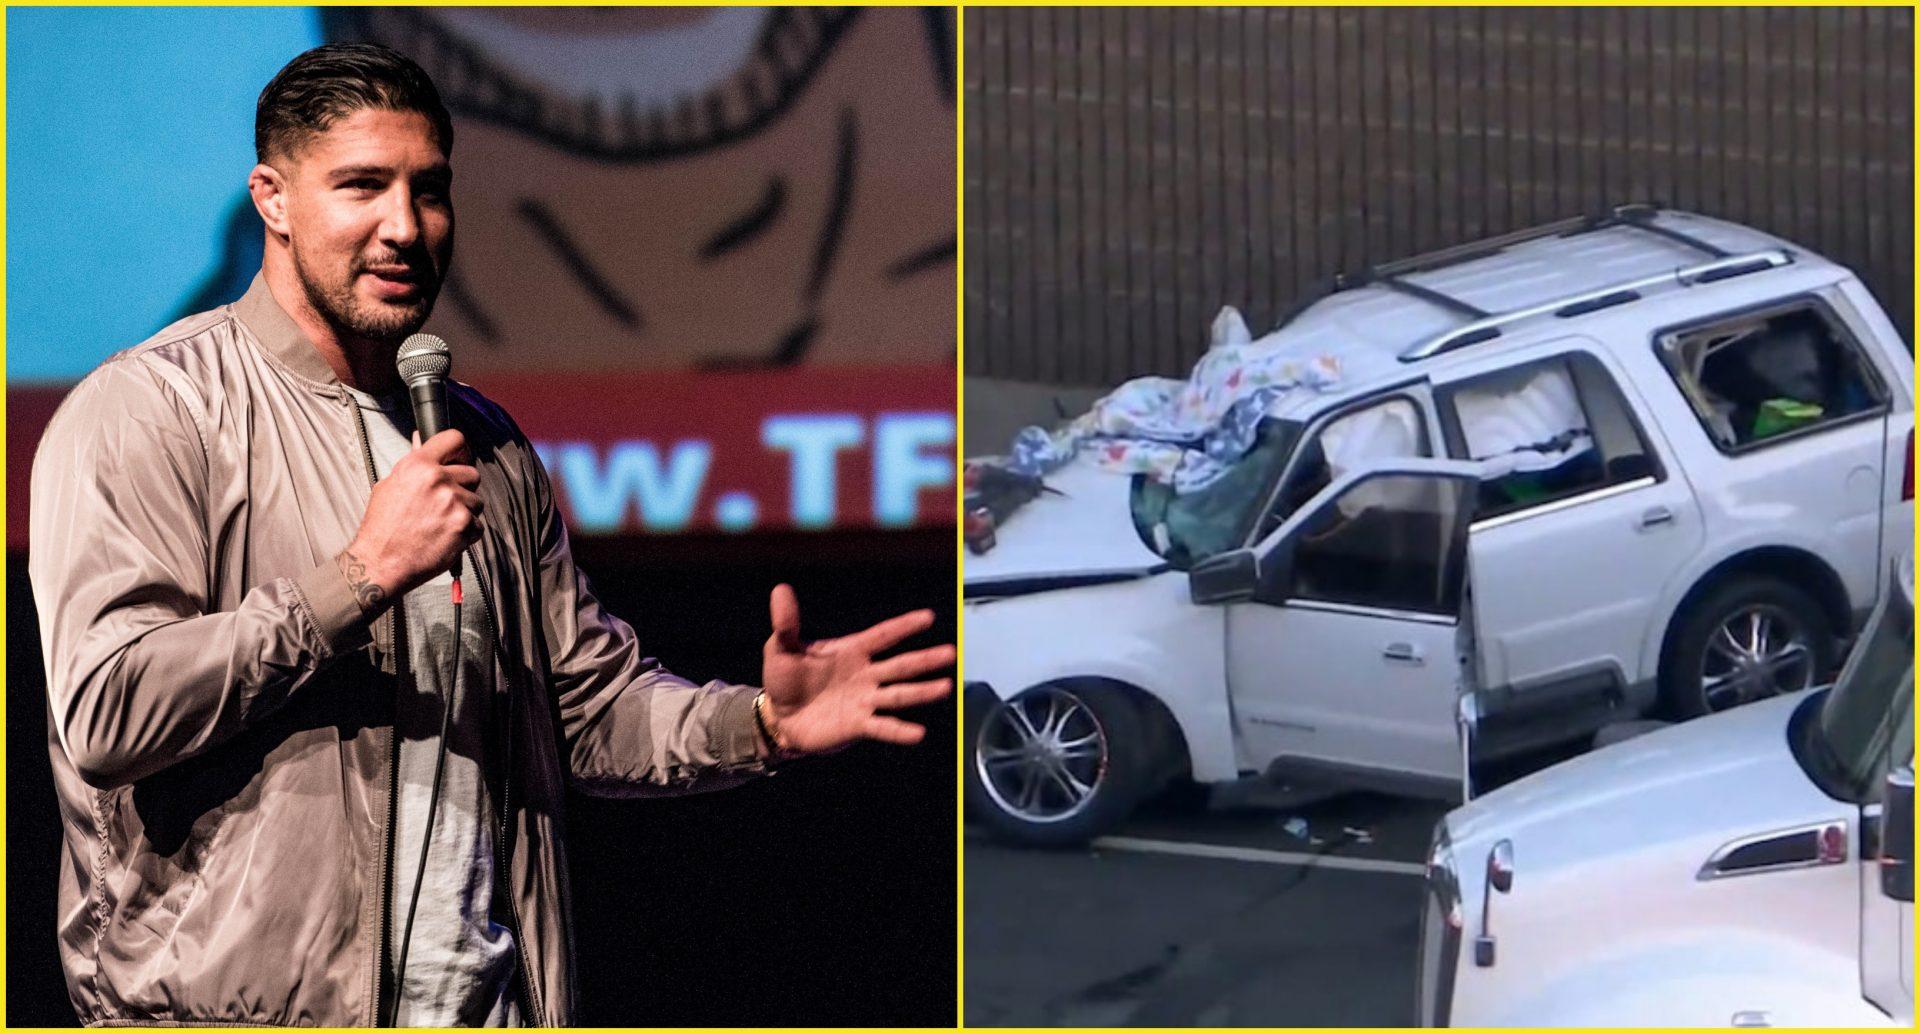 Guardian angel: Former UFC fighter Brendan Schaub saves children from deadly car crash - Schaub